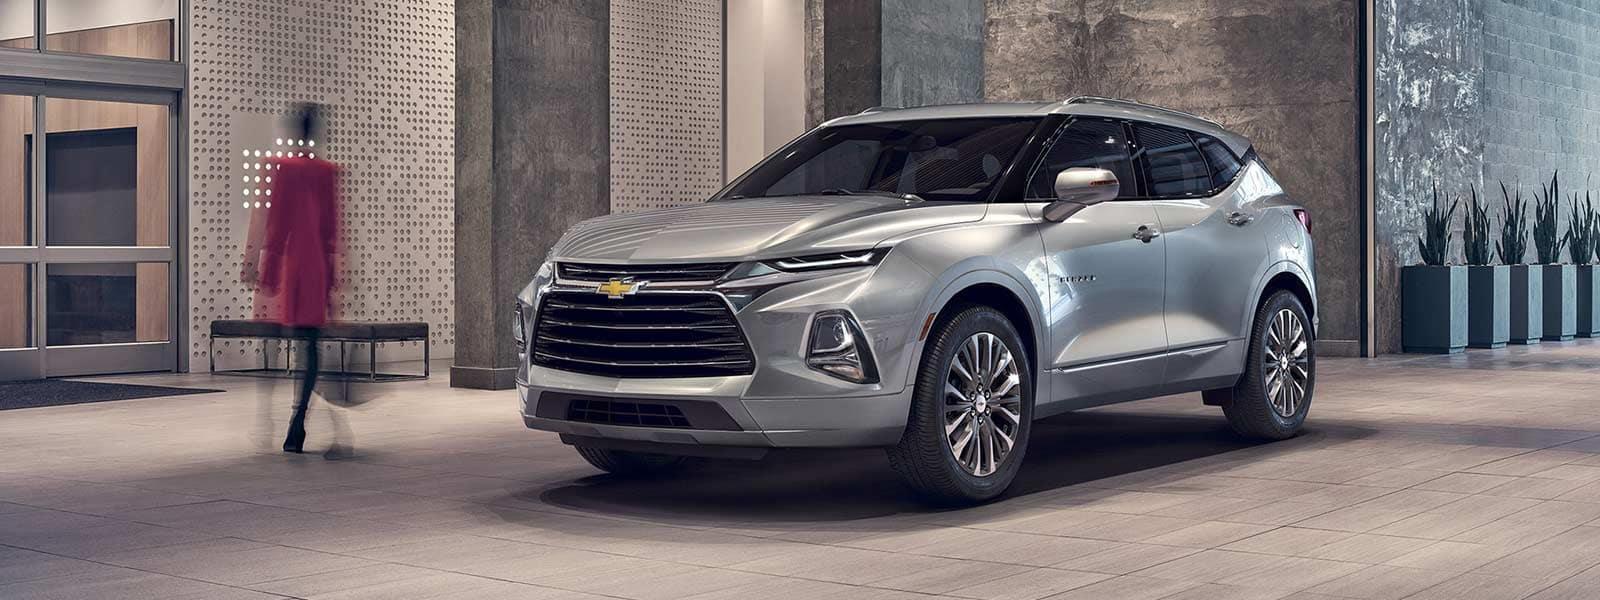 Buy new 2021 Chevrolet Blazer in Stanleytown Virginia